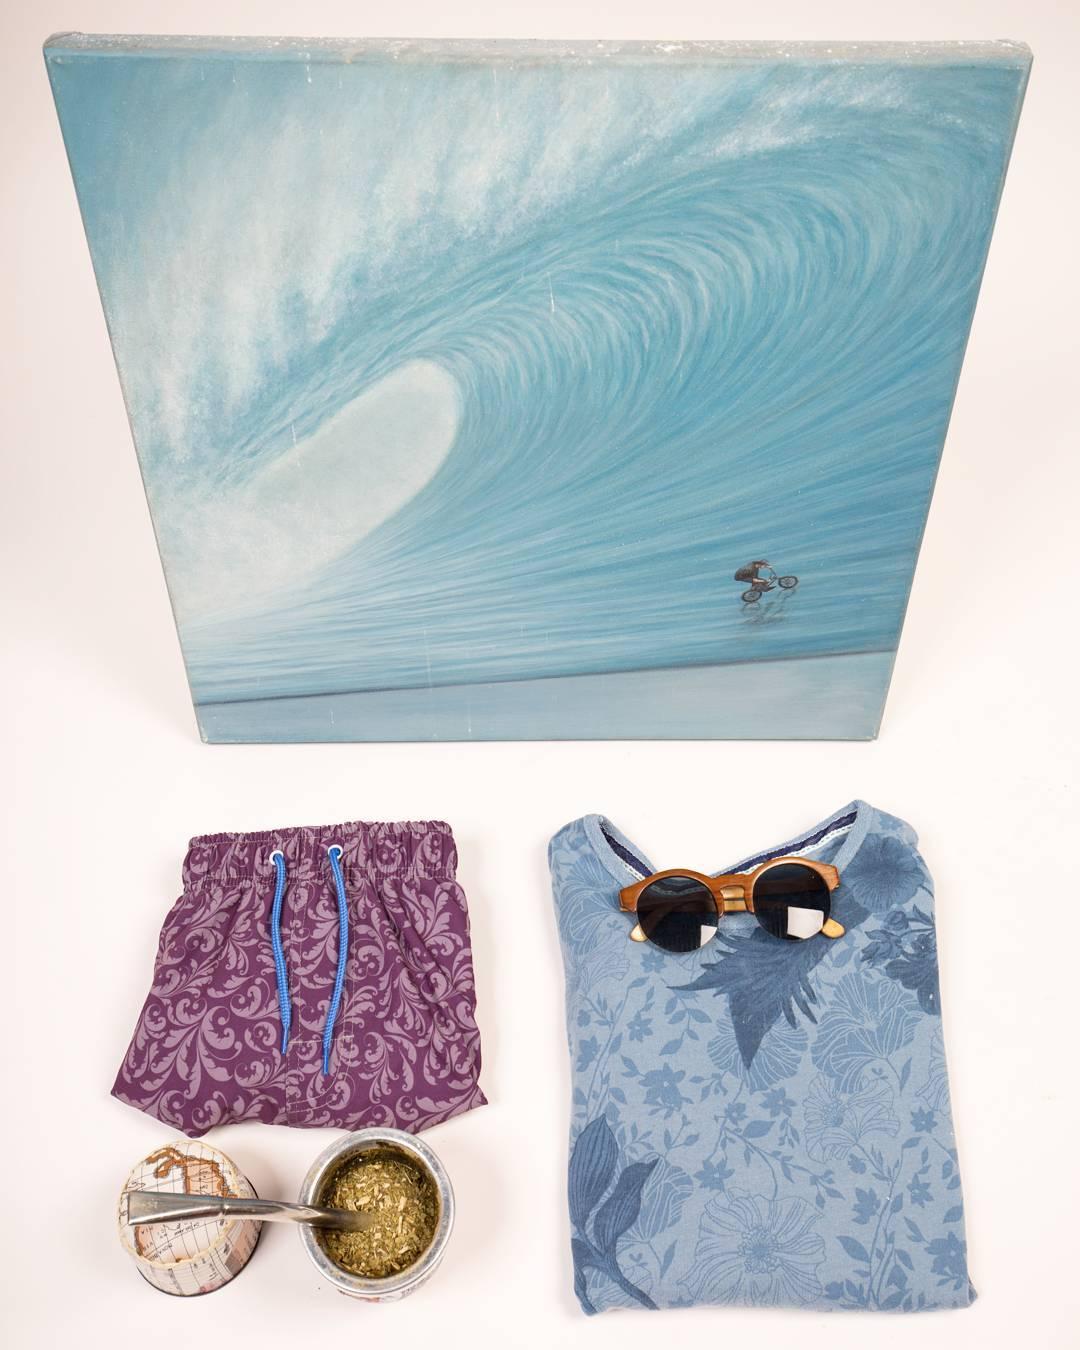 ¿Ya pensando en la playa? ¡Que no te falte tu Kit Crouch!